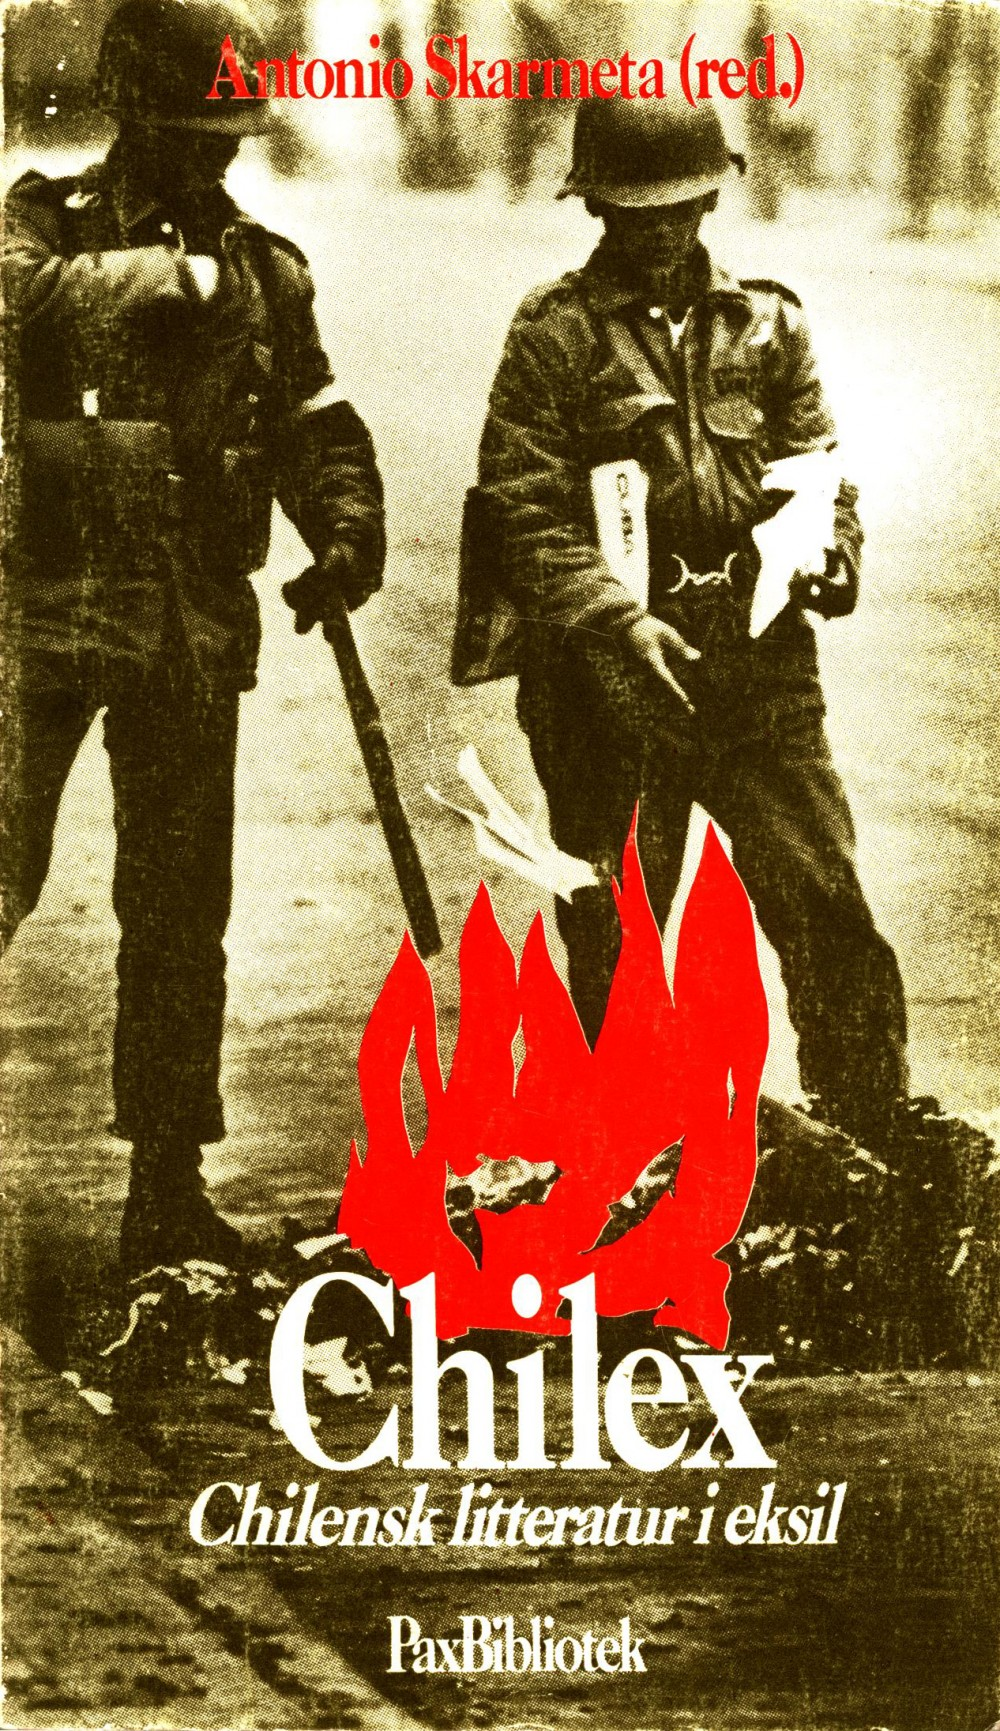 Antonio Skármeta (red): Chilex - Chilensk litteratur i eksil